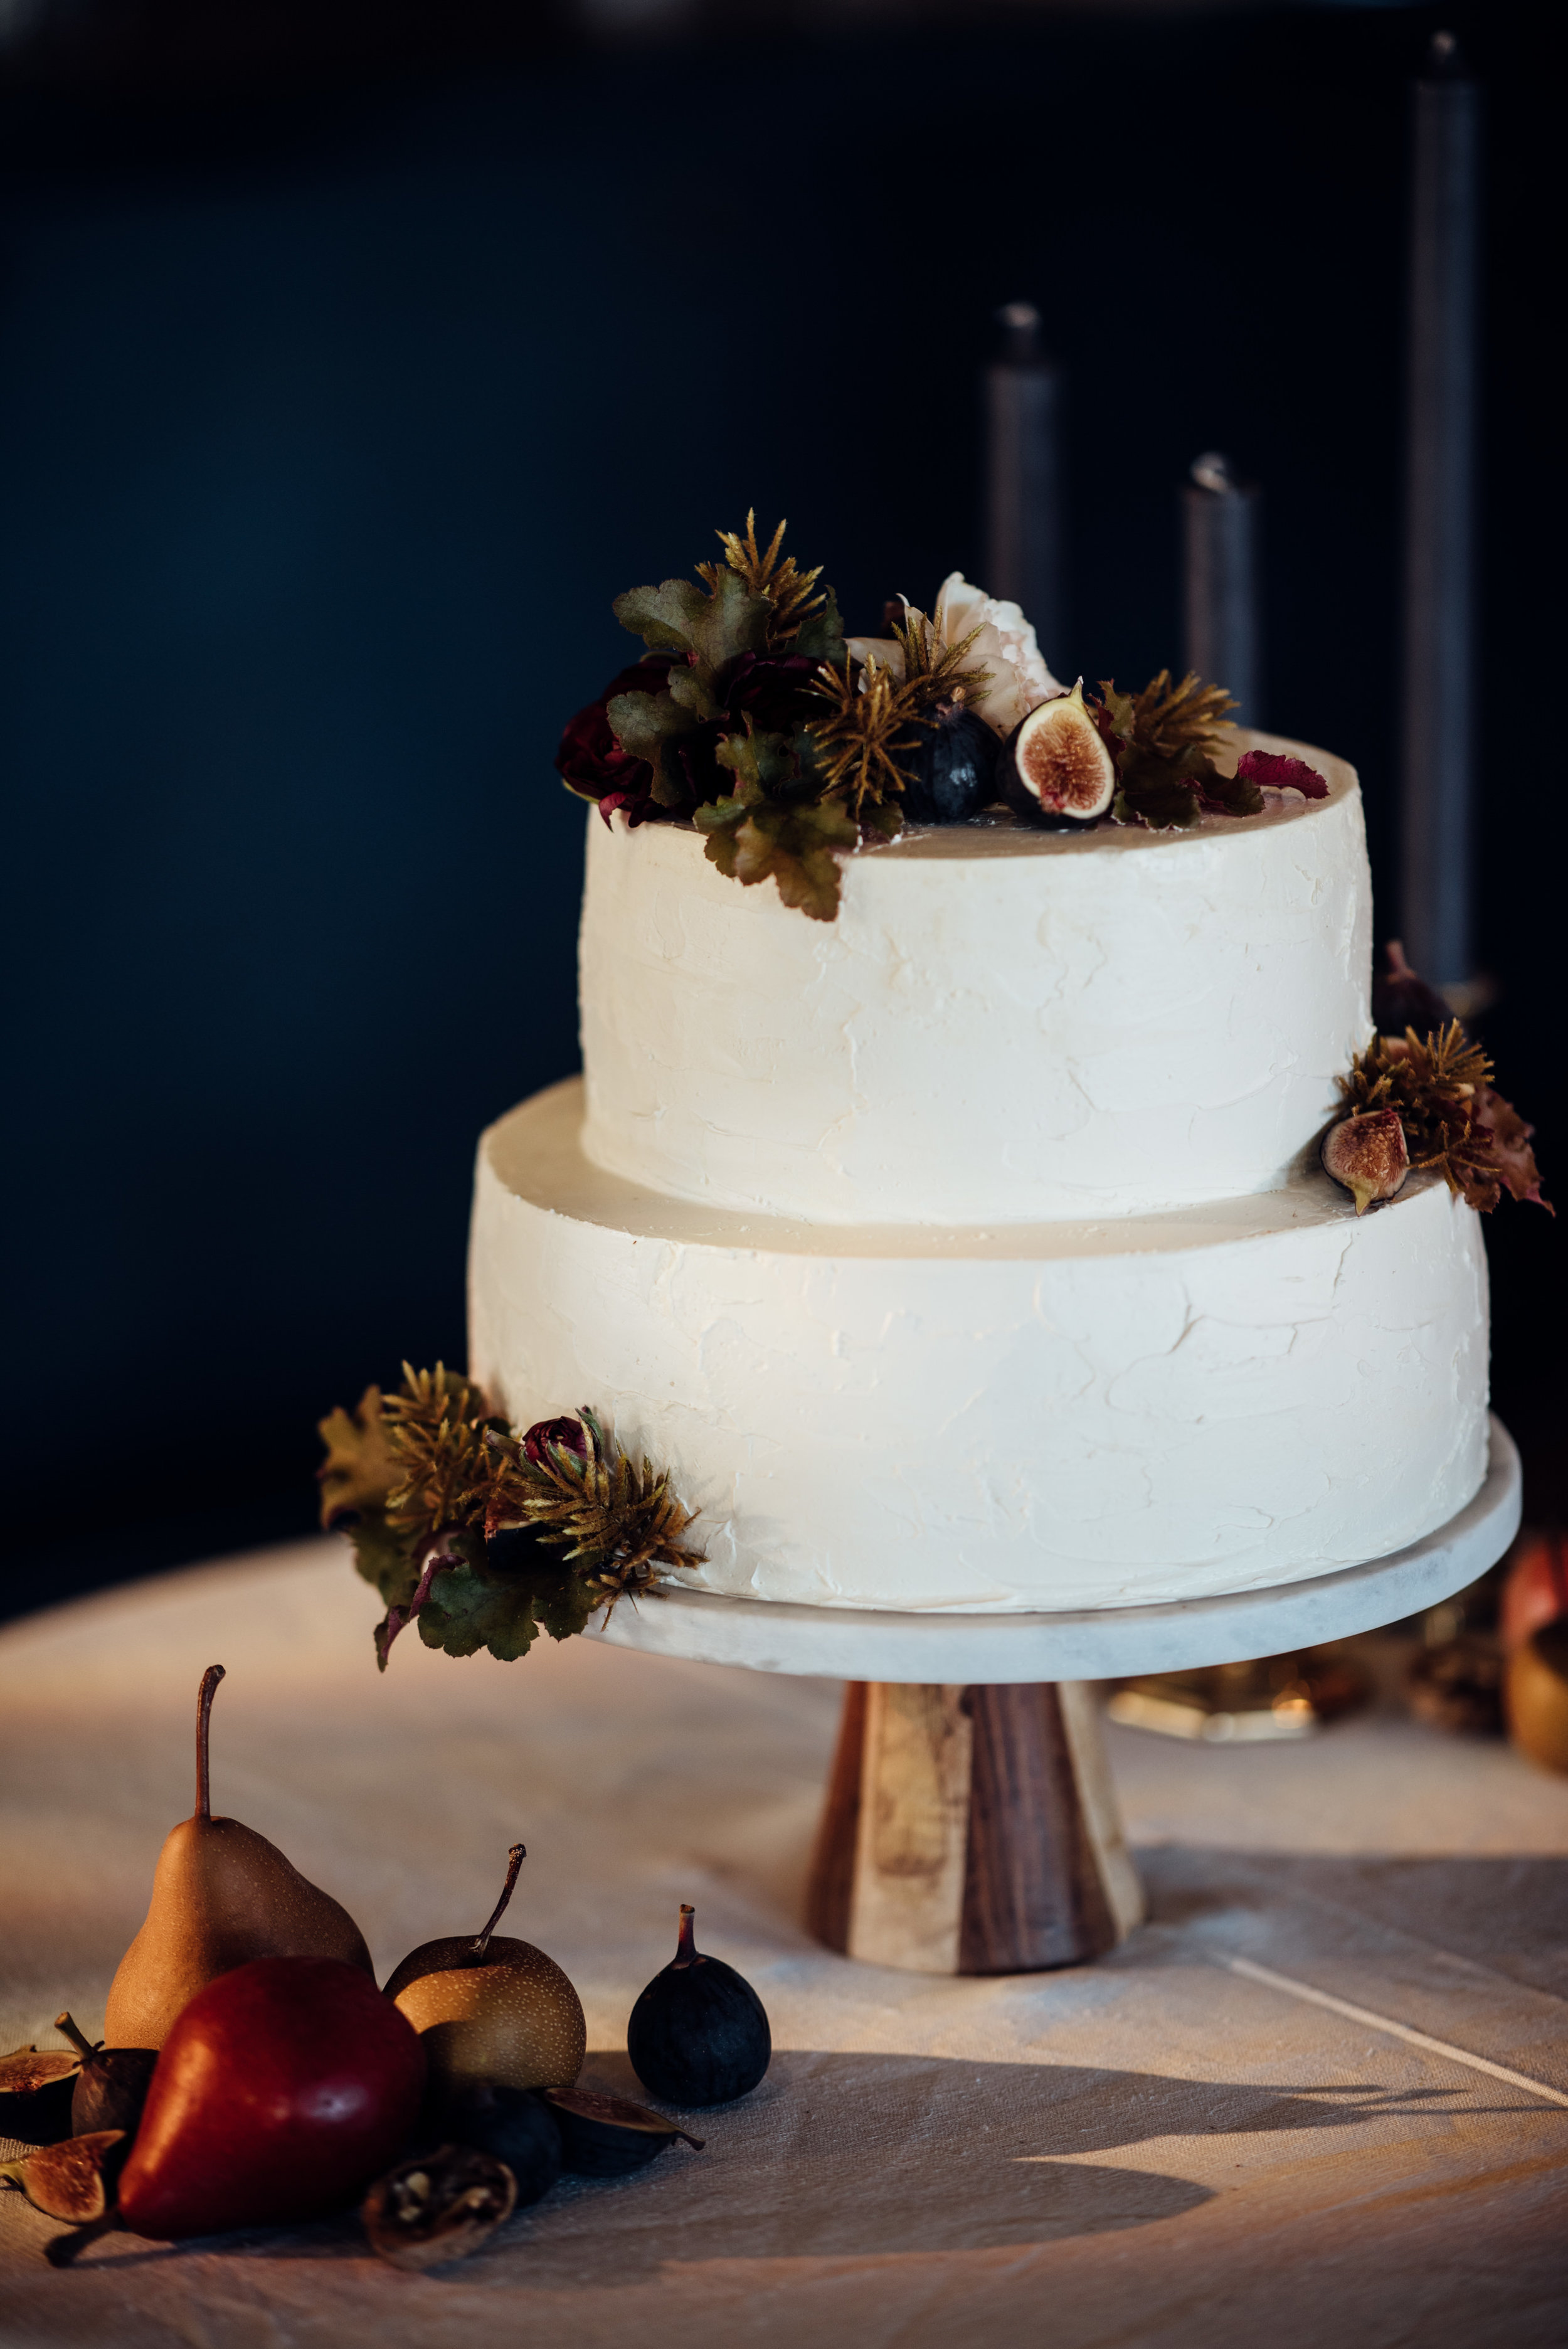 Modern San Francisco Wedding Cake Inspiration-The Commissary, Presidio San Francisco- Cake Bloom, Sonoma, California.jpg